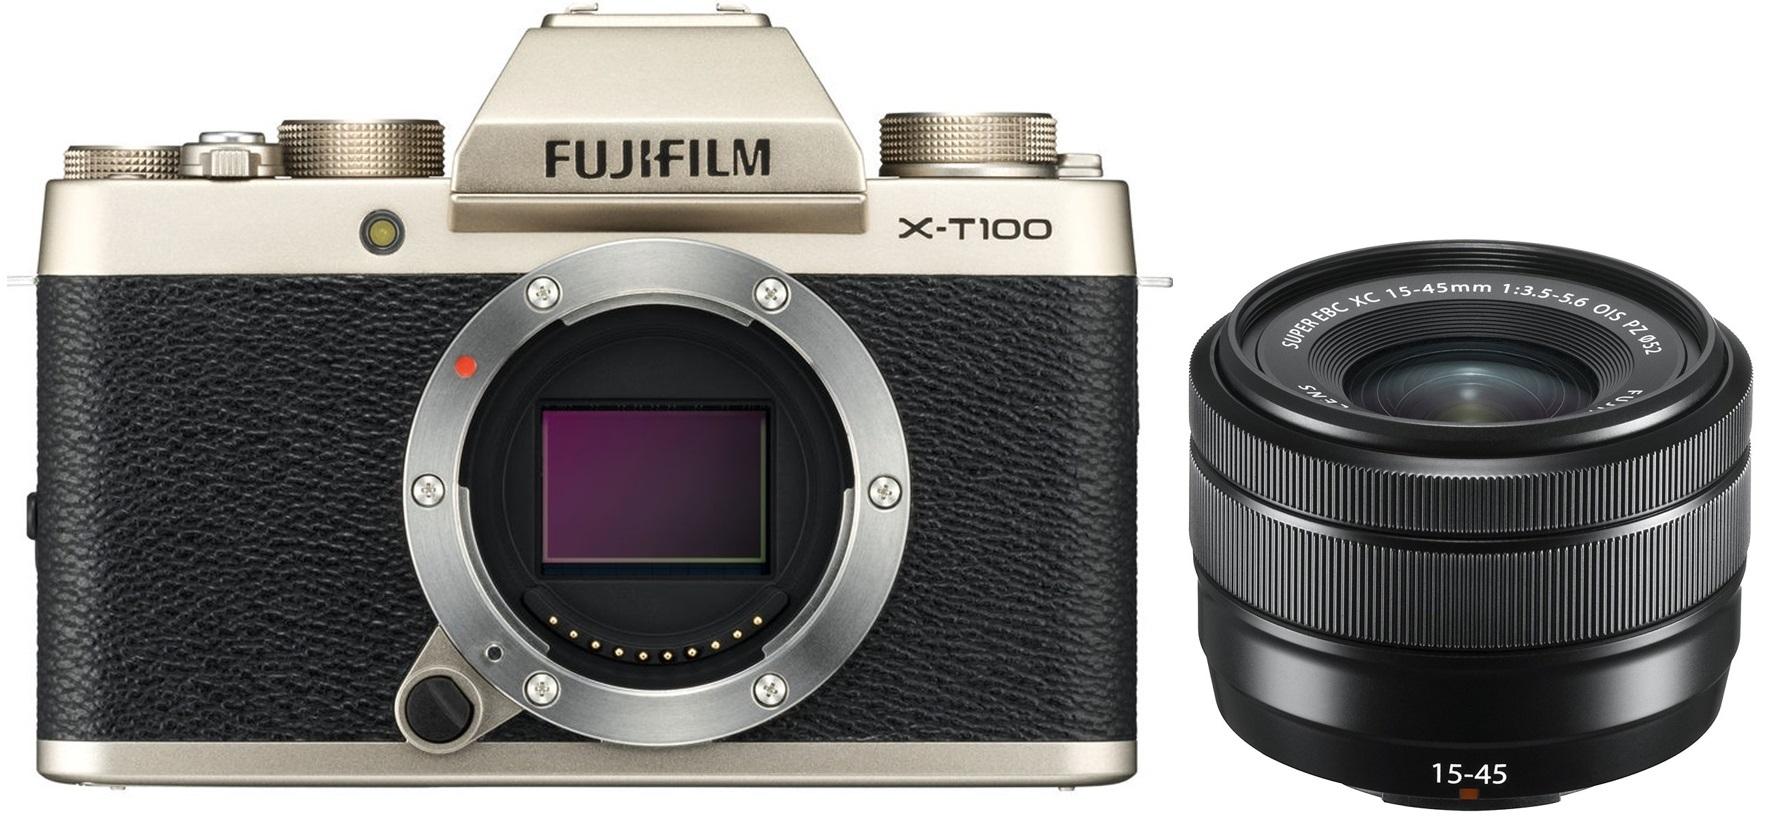 FUJIFILM X-T100 zlatý + XC 15-45 mm